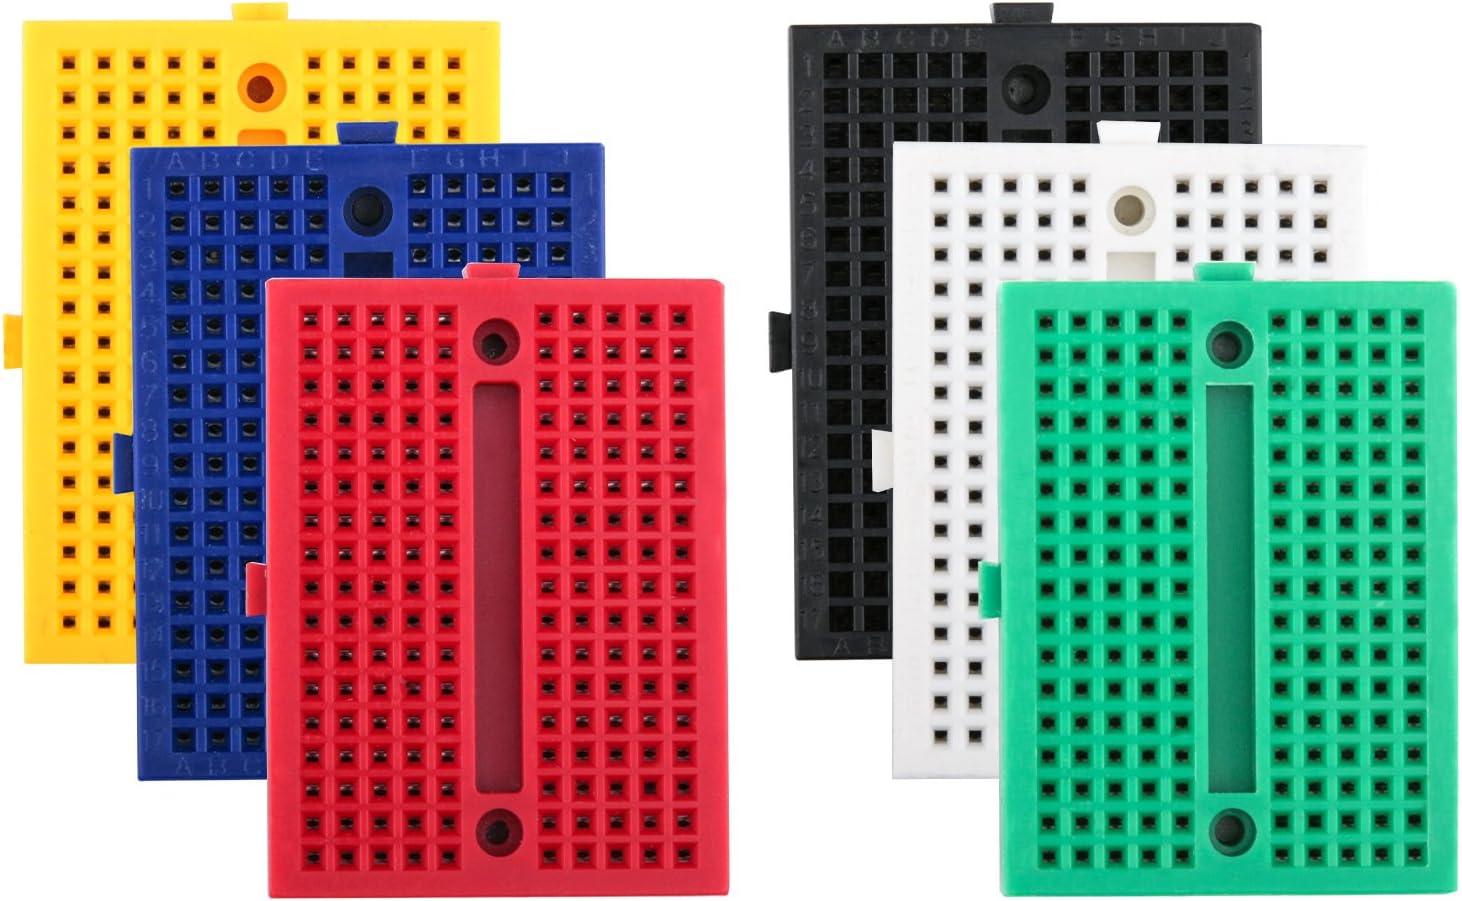 6 Color Mini Solderless Prototype Breadboard 170 Tie-points for 2017 ~